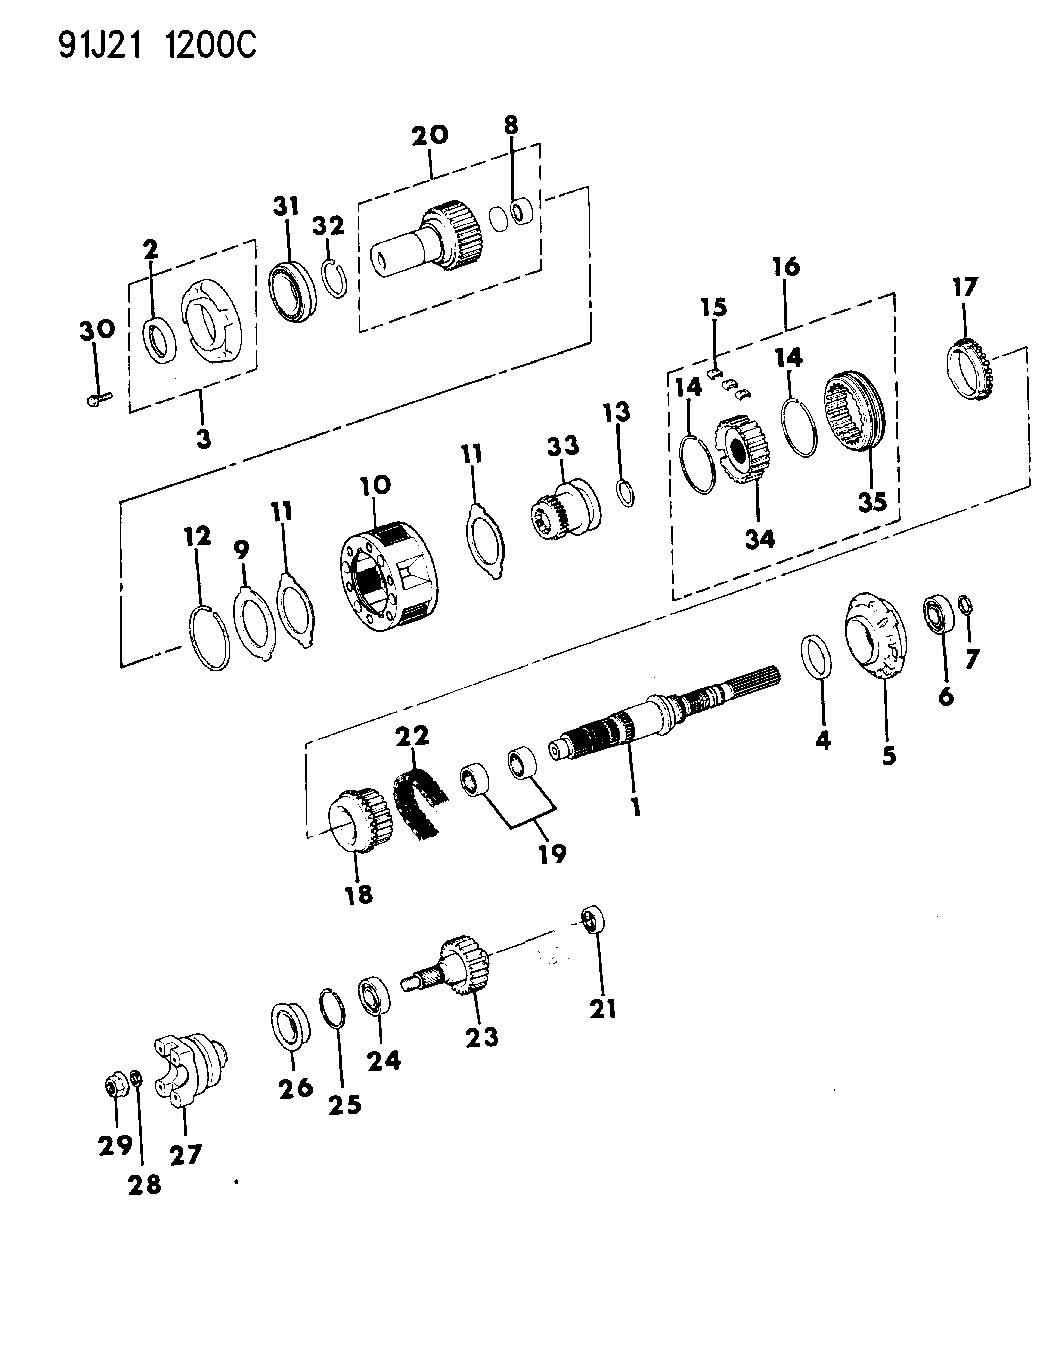 Ford Ranger Transfer Case Wiring Diagram Ford Ranger Transfer Case Control Module Wiring